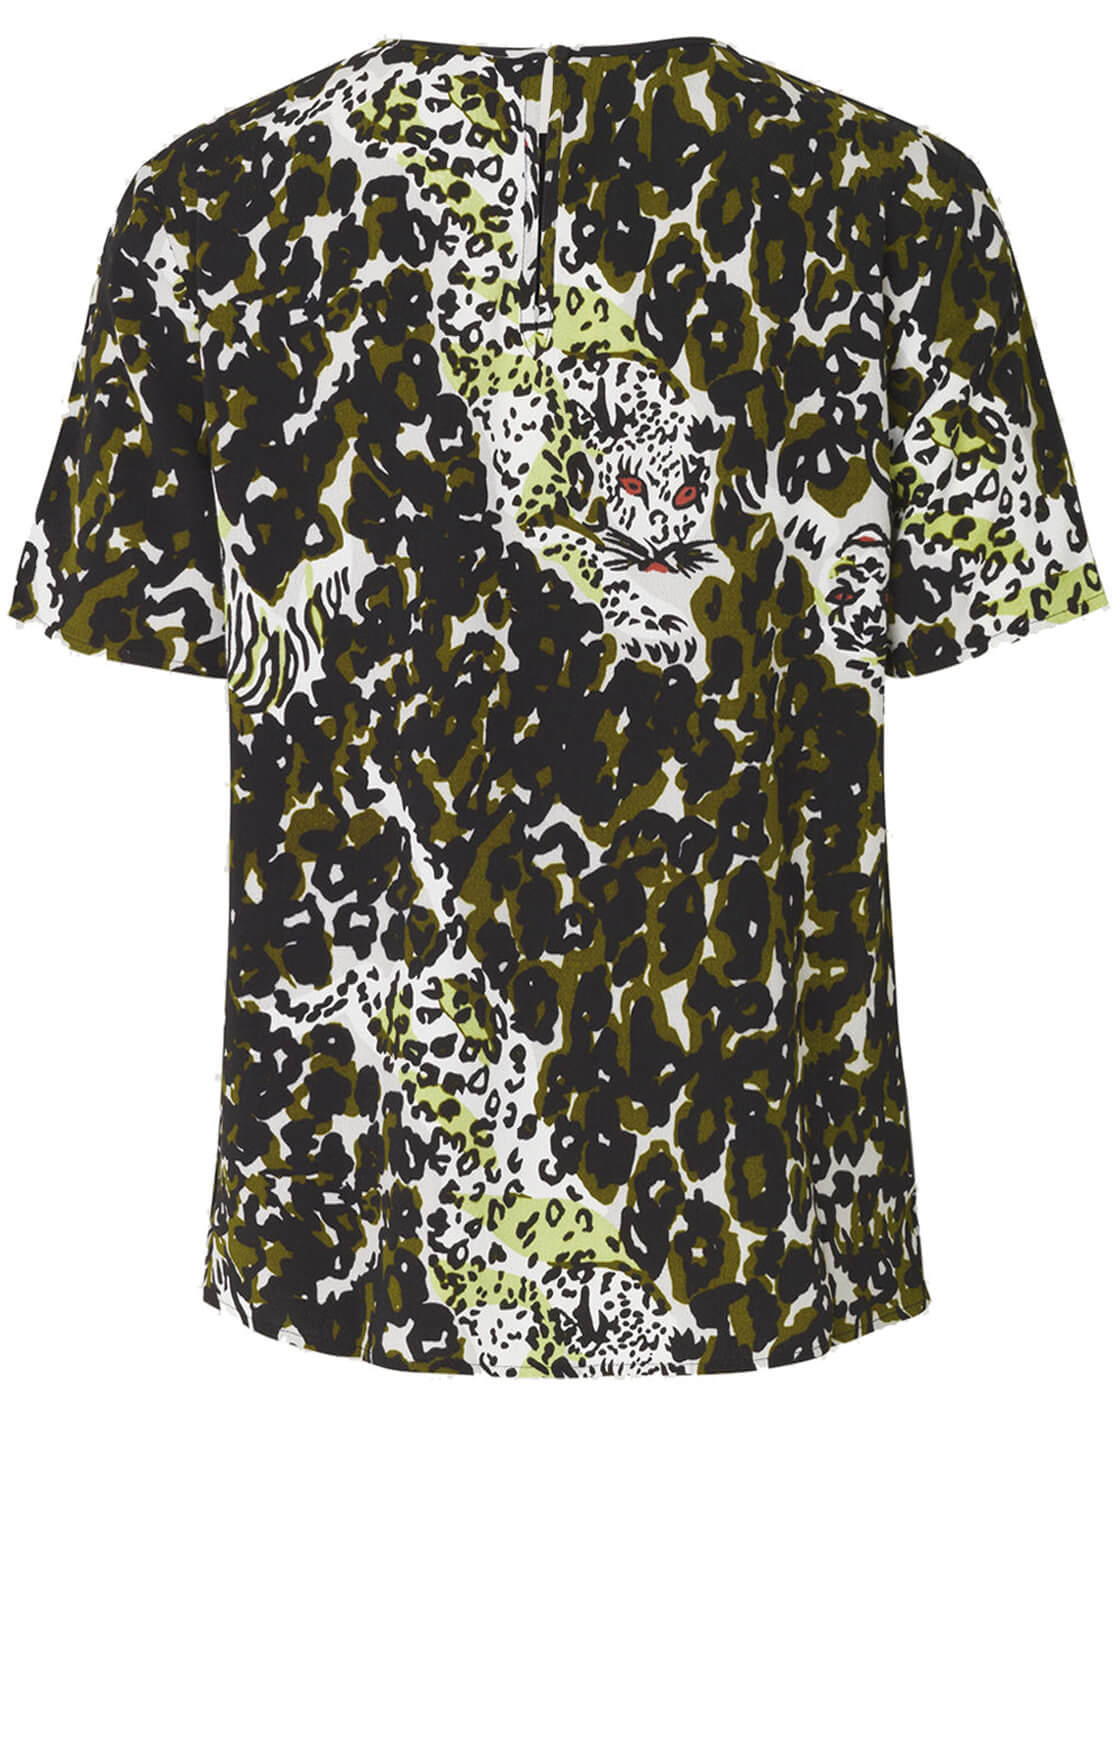 Samsoe Samsoe Dames Herdis camouflage shirt groen